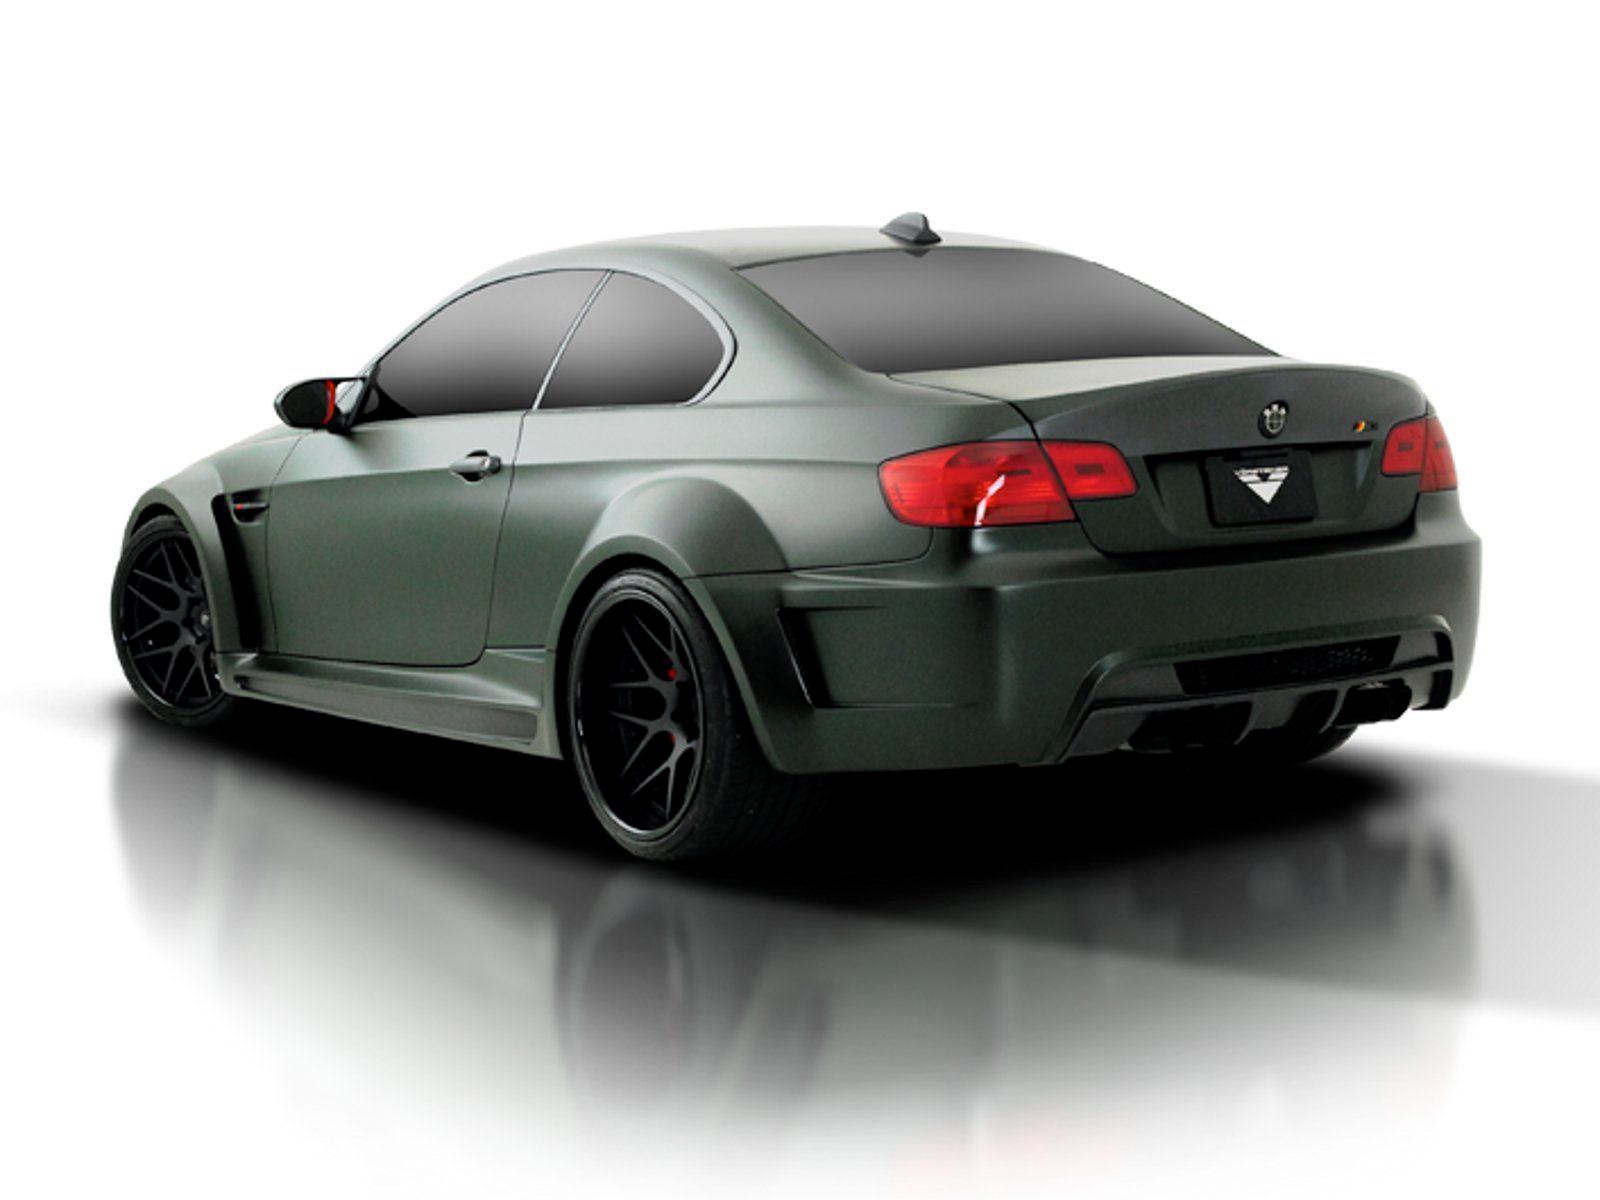 BMW M3 E92 Vorsteiner GTRS3 Wide Kit Revealed w/Video Bmw M Wide Kit on mazda rx 7 kit, audi r8 spyder kit, datsun 240z kit, e36 m3 kit, mclaren f1 kit, mazda mx5 kit, porsche gt3 kit, honda accord kit, audi q5 kit, datsun 510 kit, toyota solara kit, acura rsx kit, e60 m5 kit, nsx kit, honda s2000 kit, kia forte kit, shelby mustang kit, skyline r34 kit, toyota corolla kit, volkswagen jetta kit,